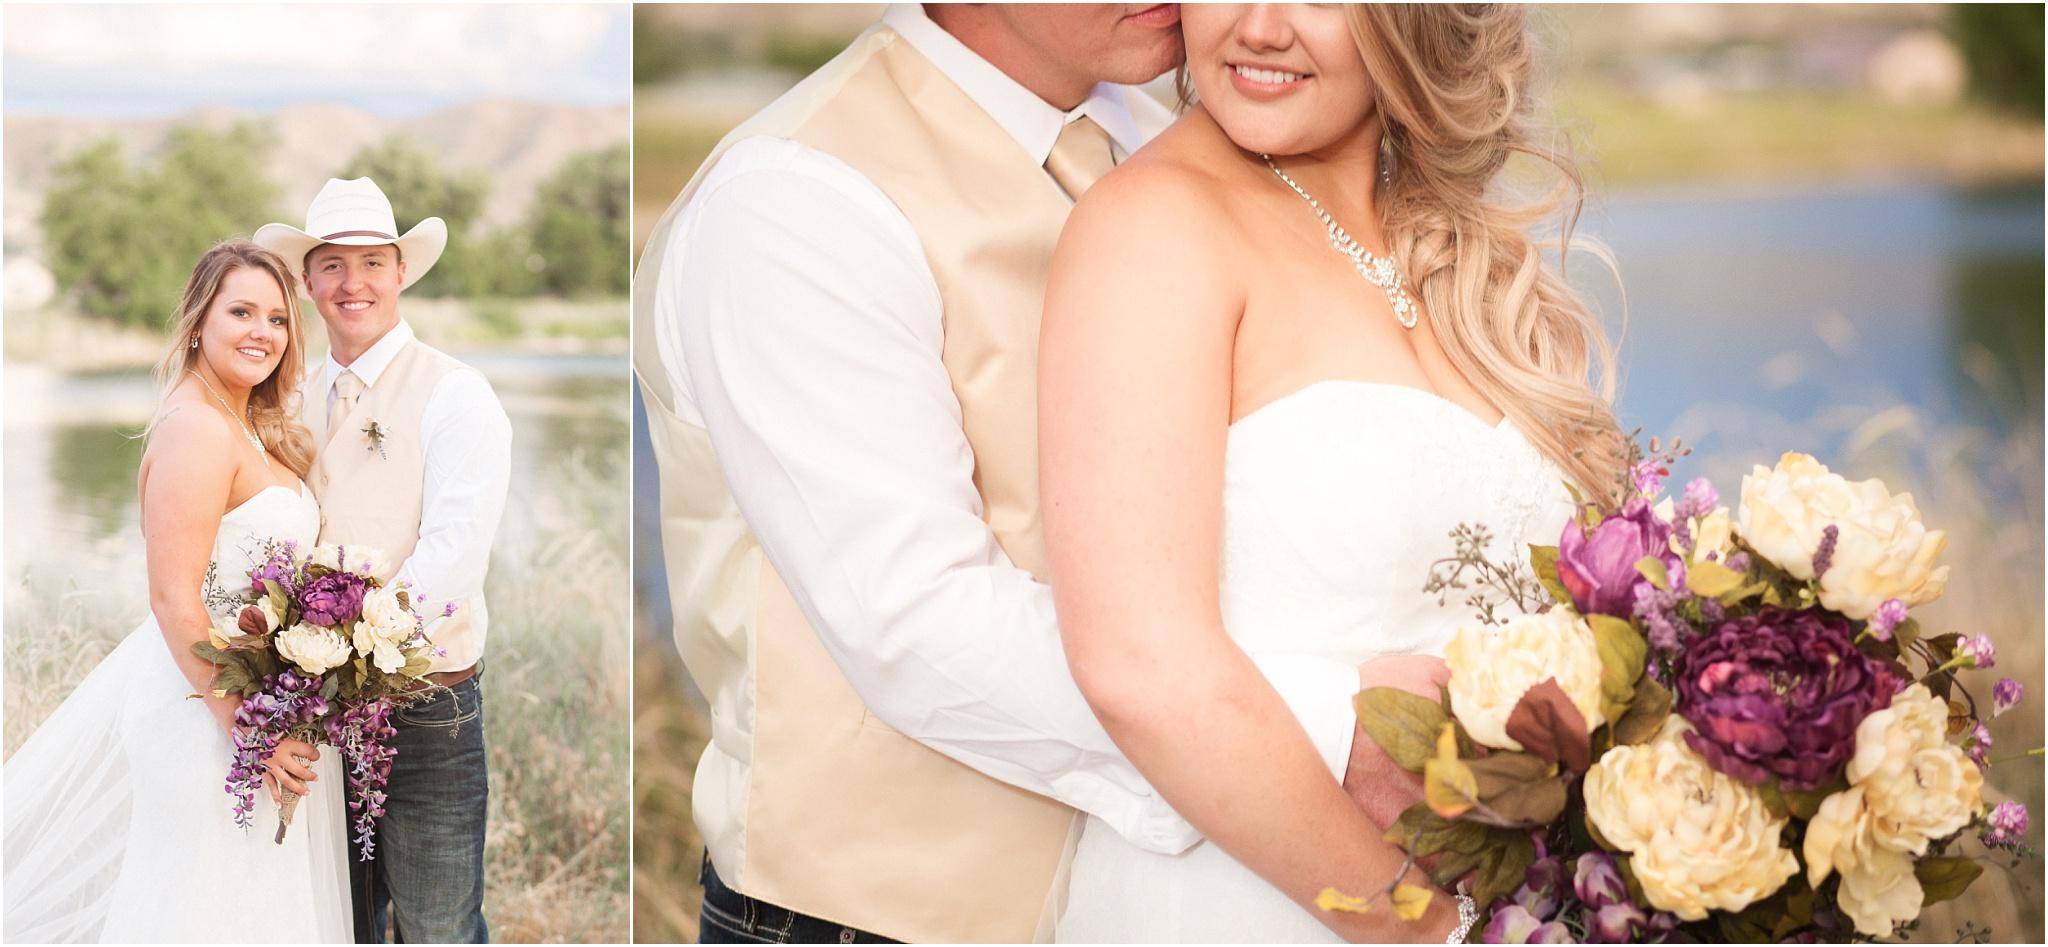 Wedding Photography_Emmett Idaho_Boise Idaho_Leah Southwick Photography_0046.jpg